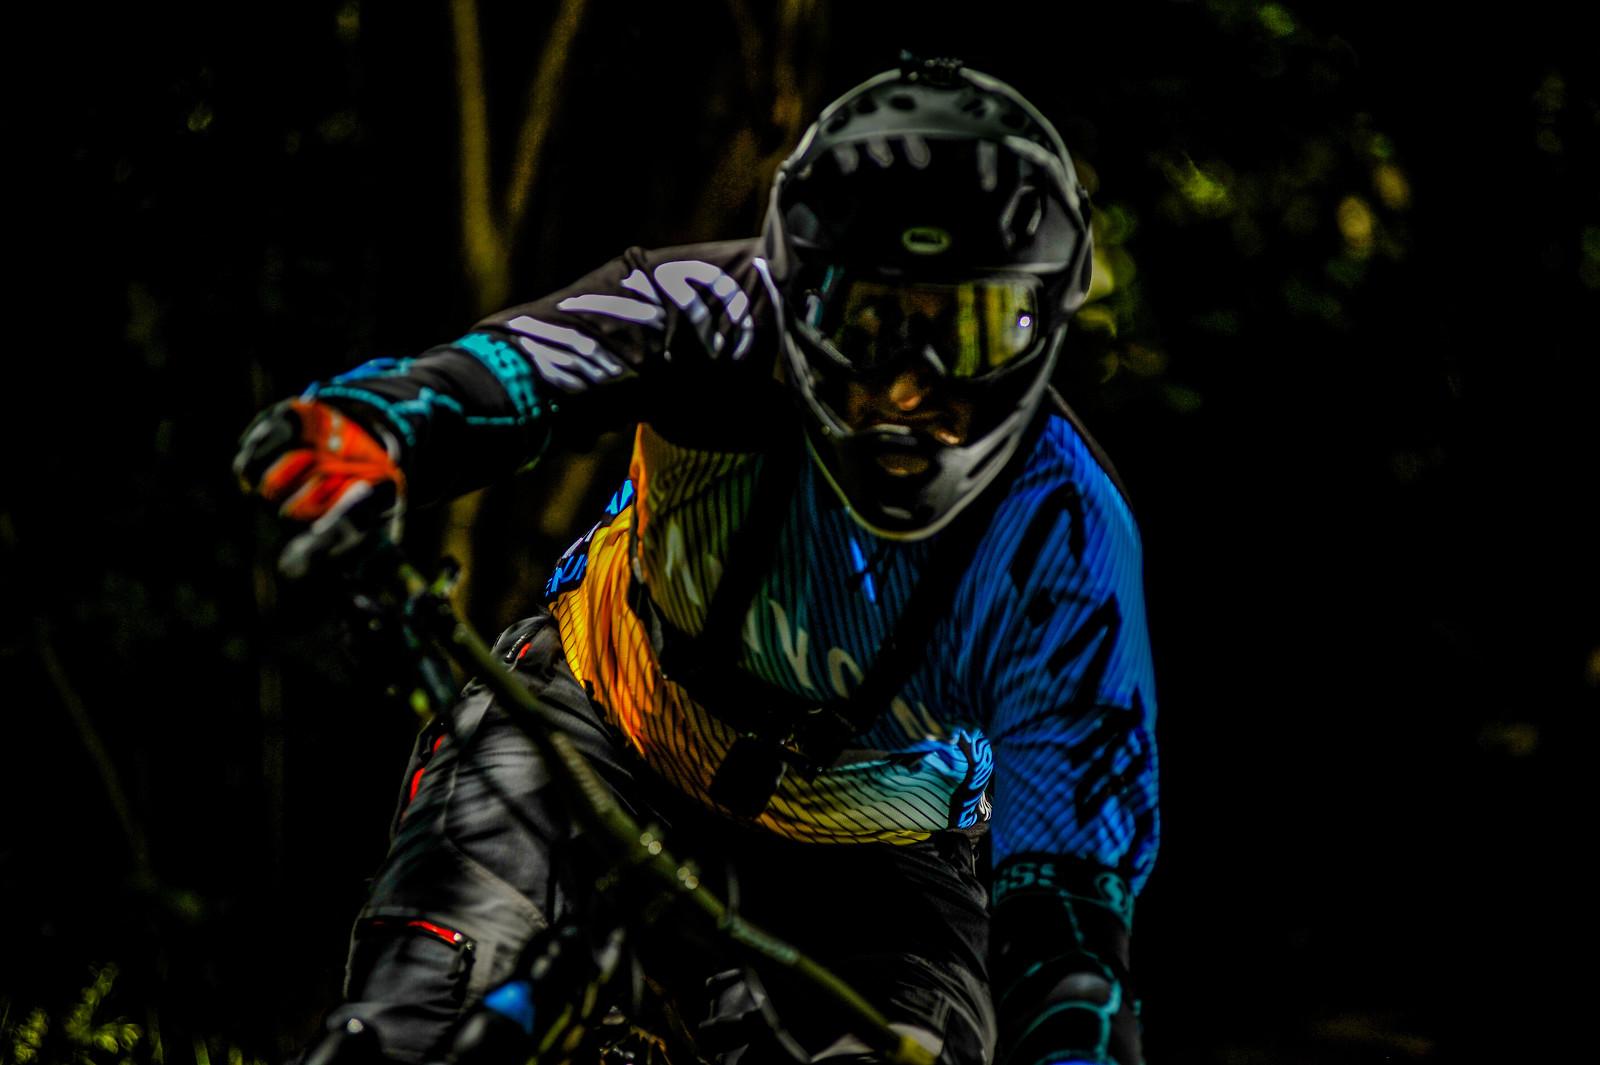 DSC4804 - robbarkerimages2017 - Mountain Biking Pictures - Vital MTB